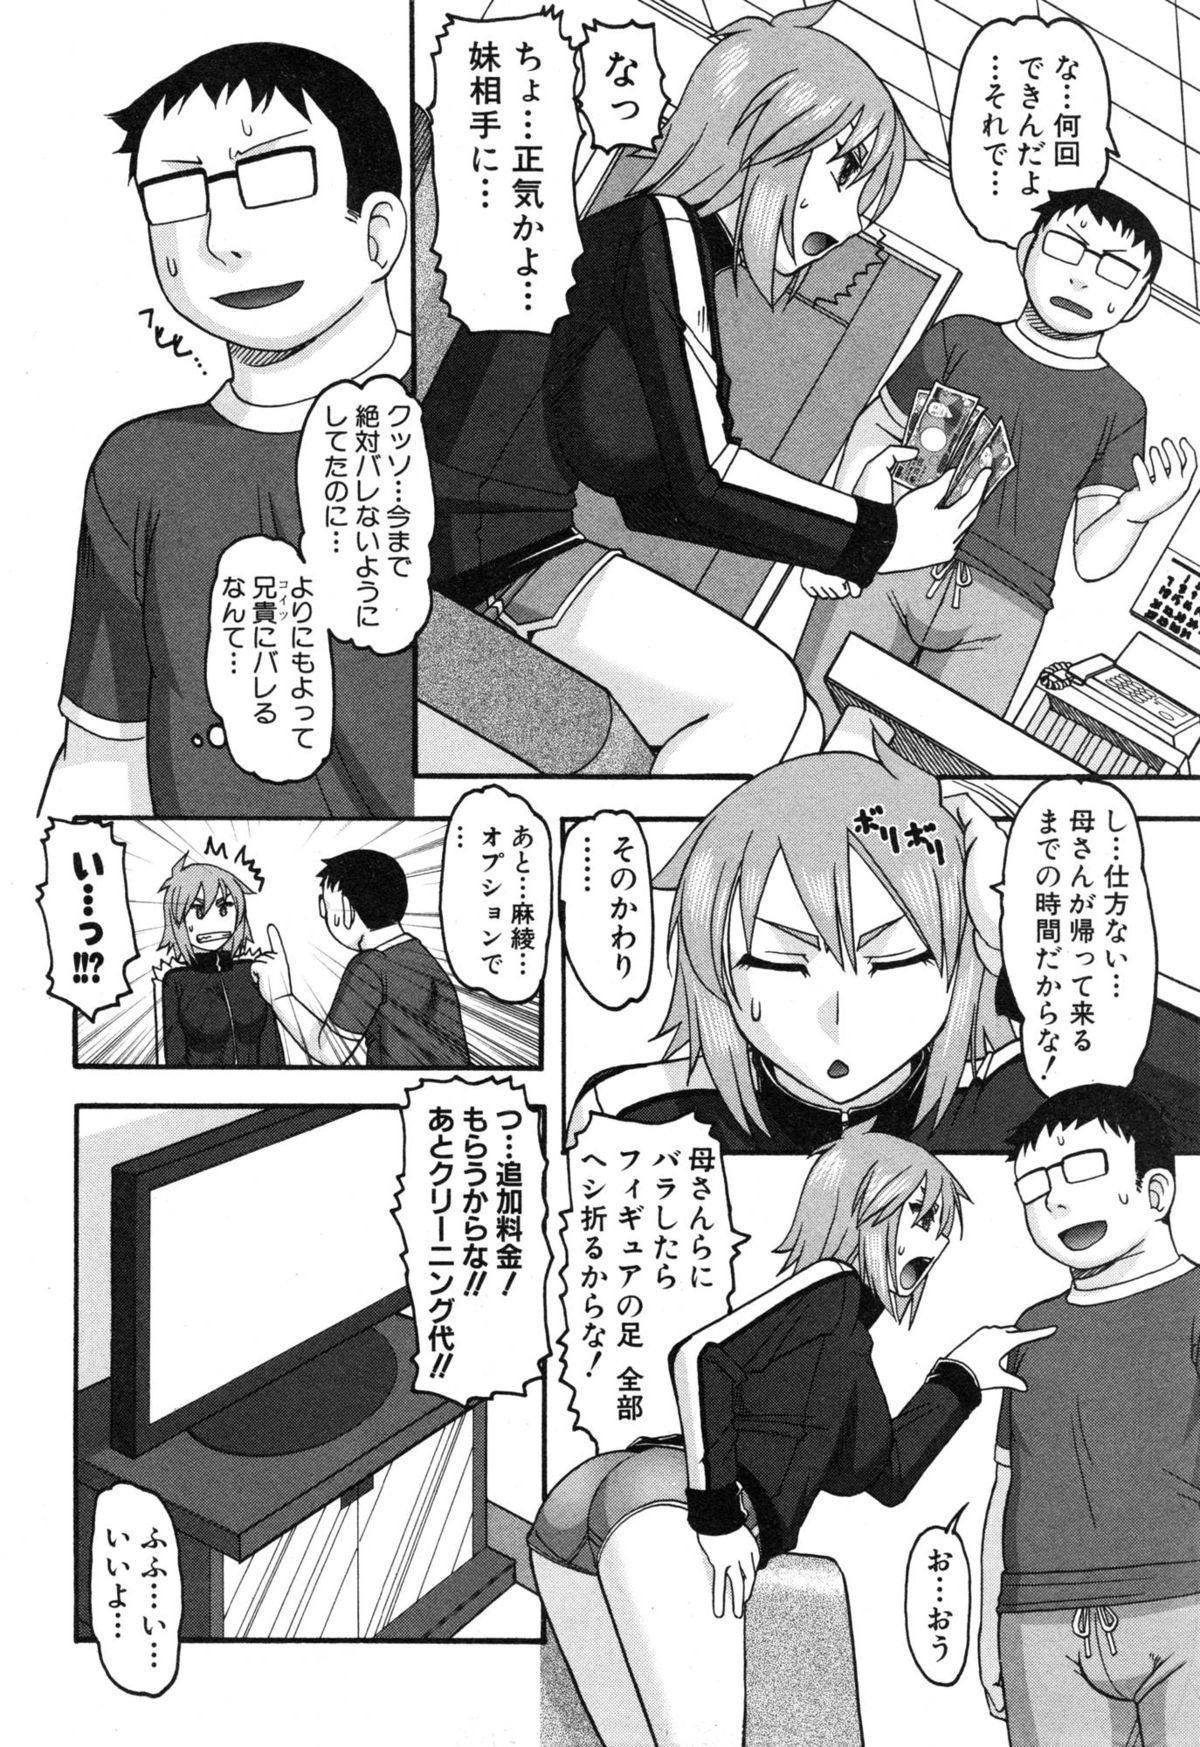 COMIC Shingeki 2015-01 297